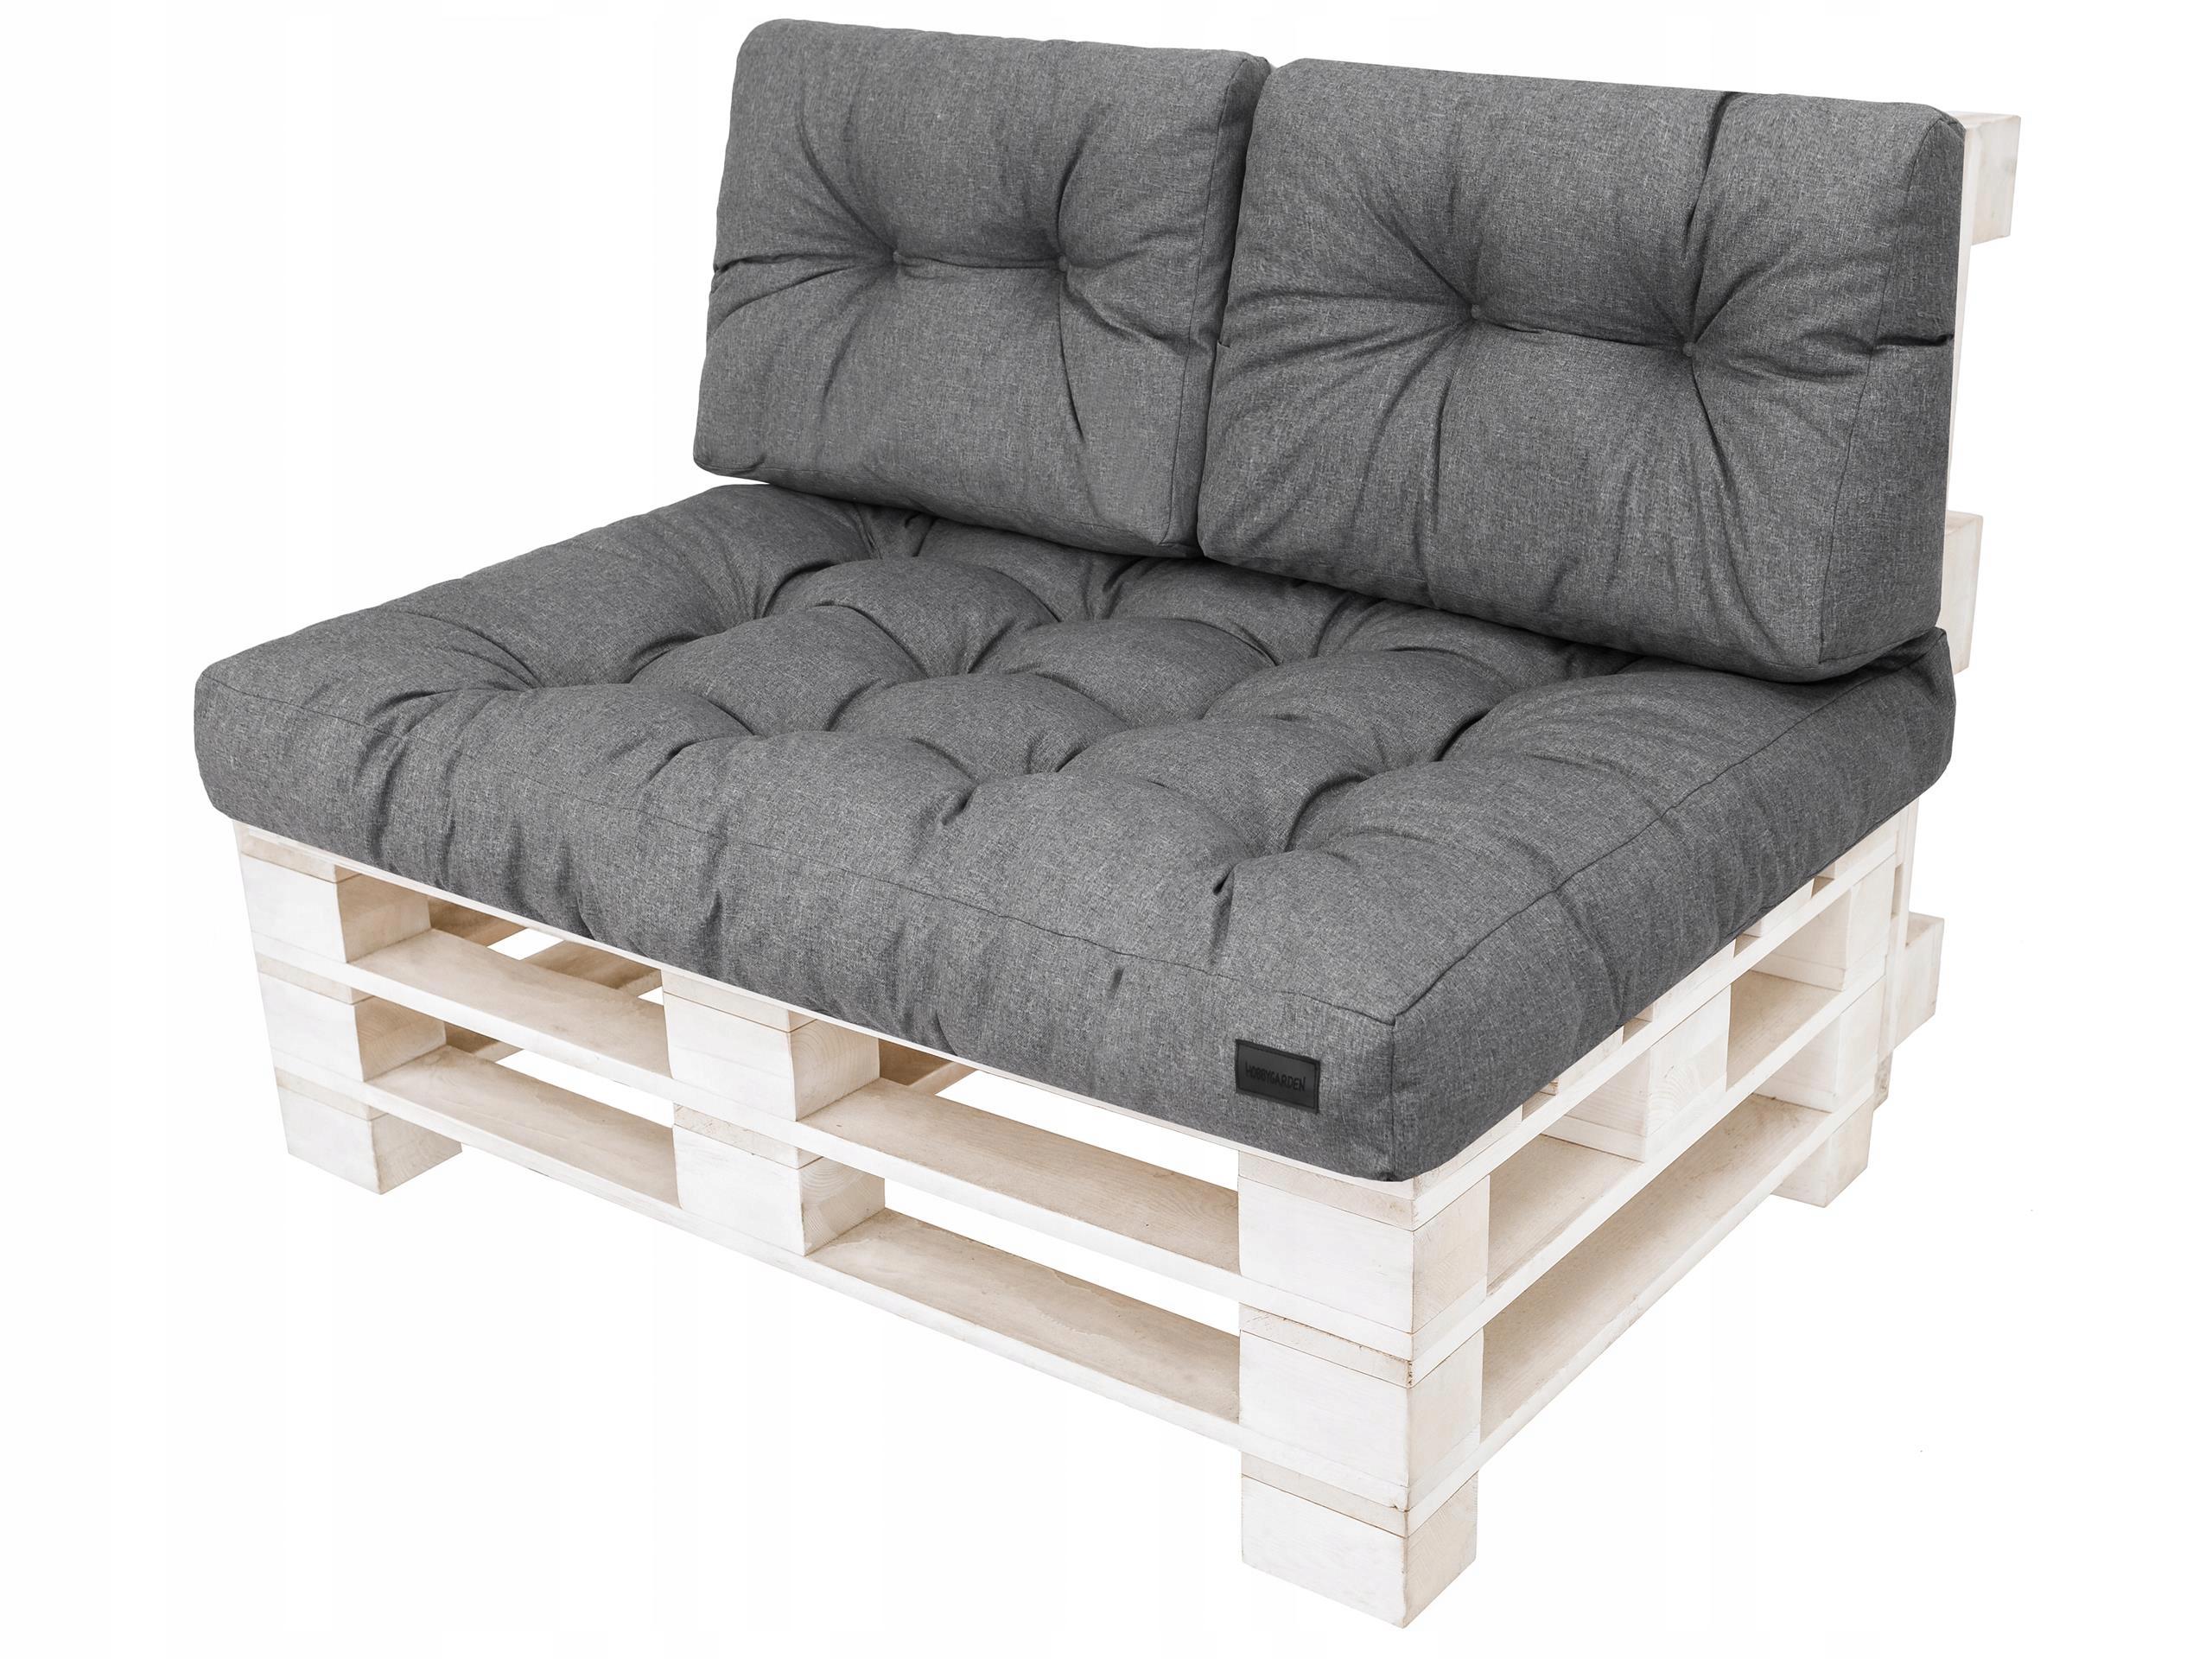 Подушки, набор подушек для диванов от Pallets